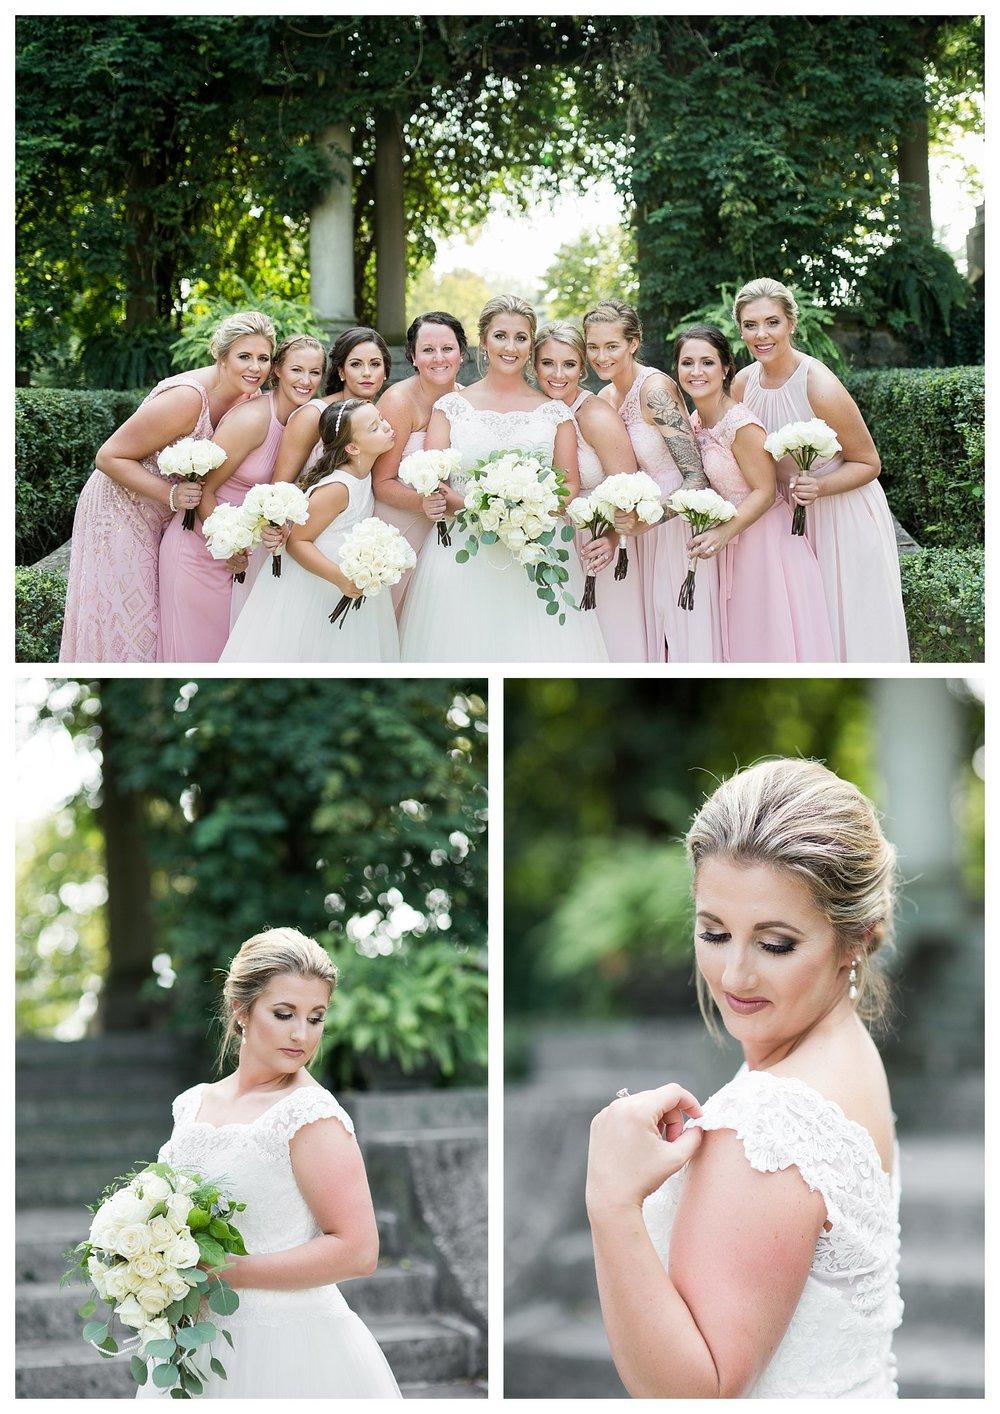 laurel-court-wedding-everleigh-photography-cincinnati-wedding-photographer-northern-ky-wedding-photographer-22